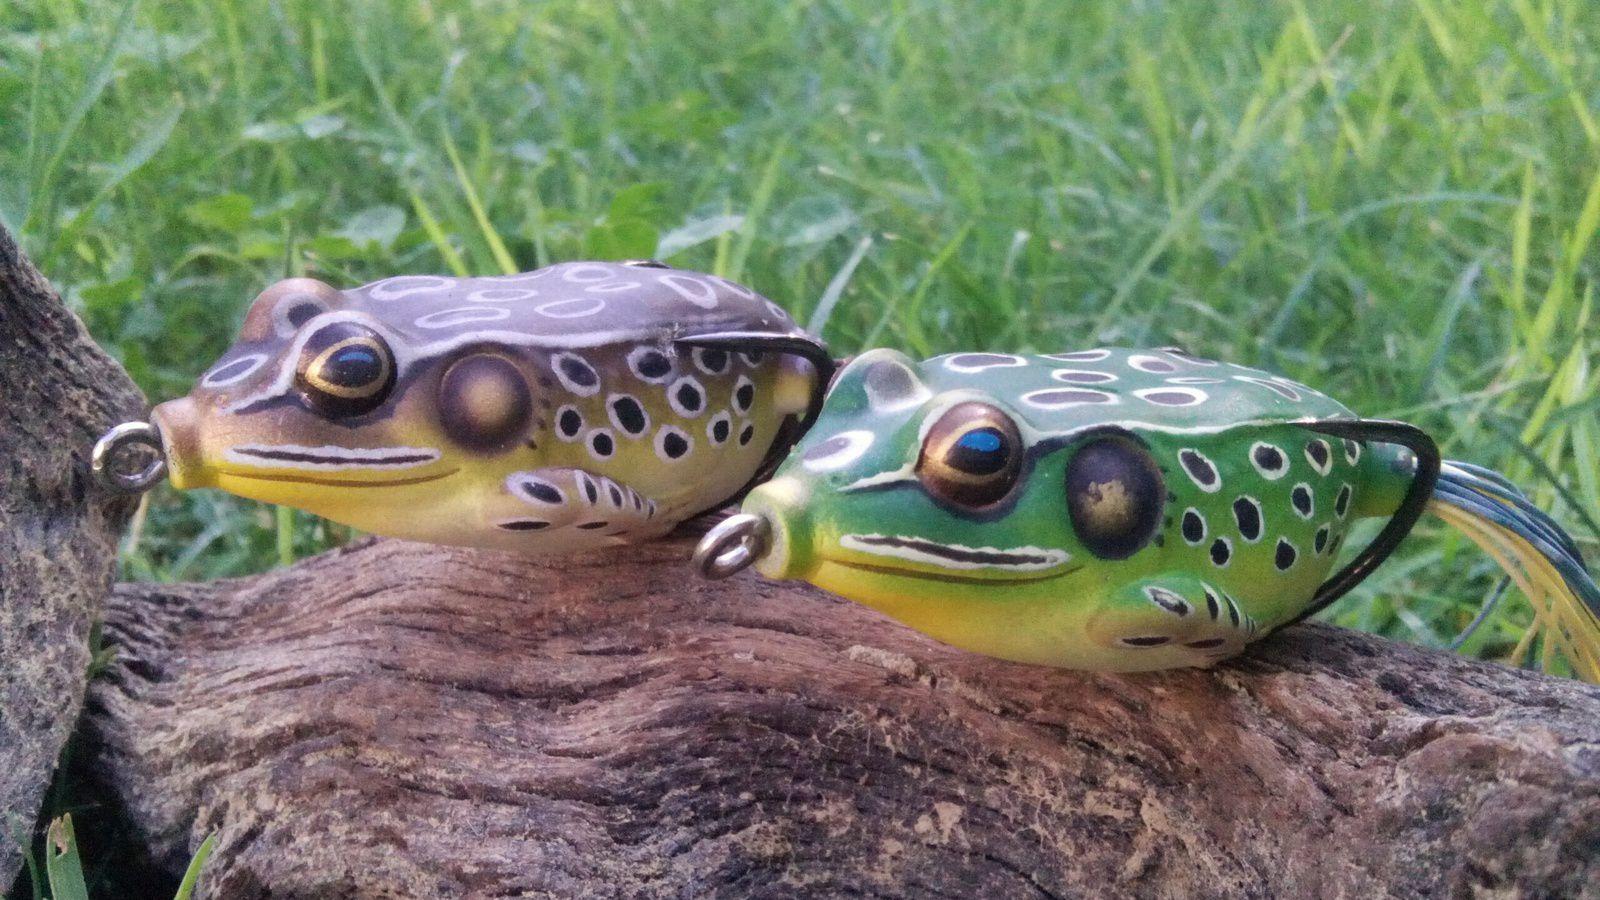 Les indispensables grenouilles, les frog hollow body.